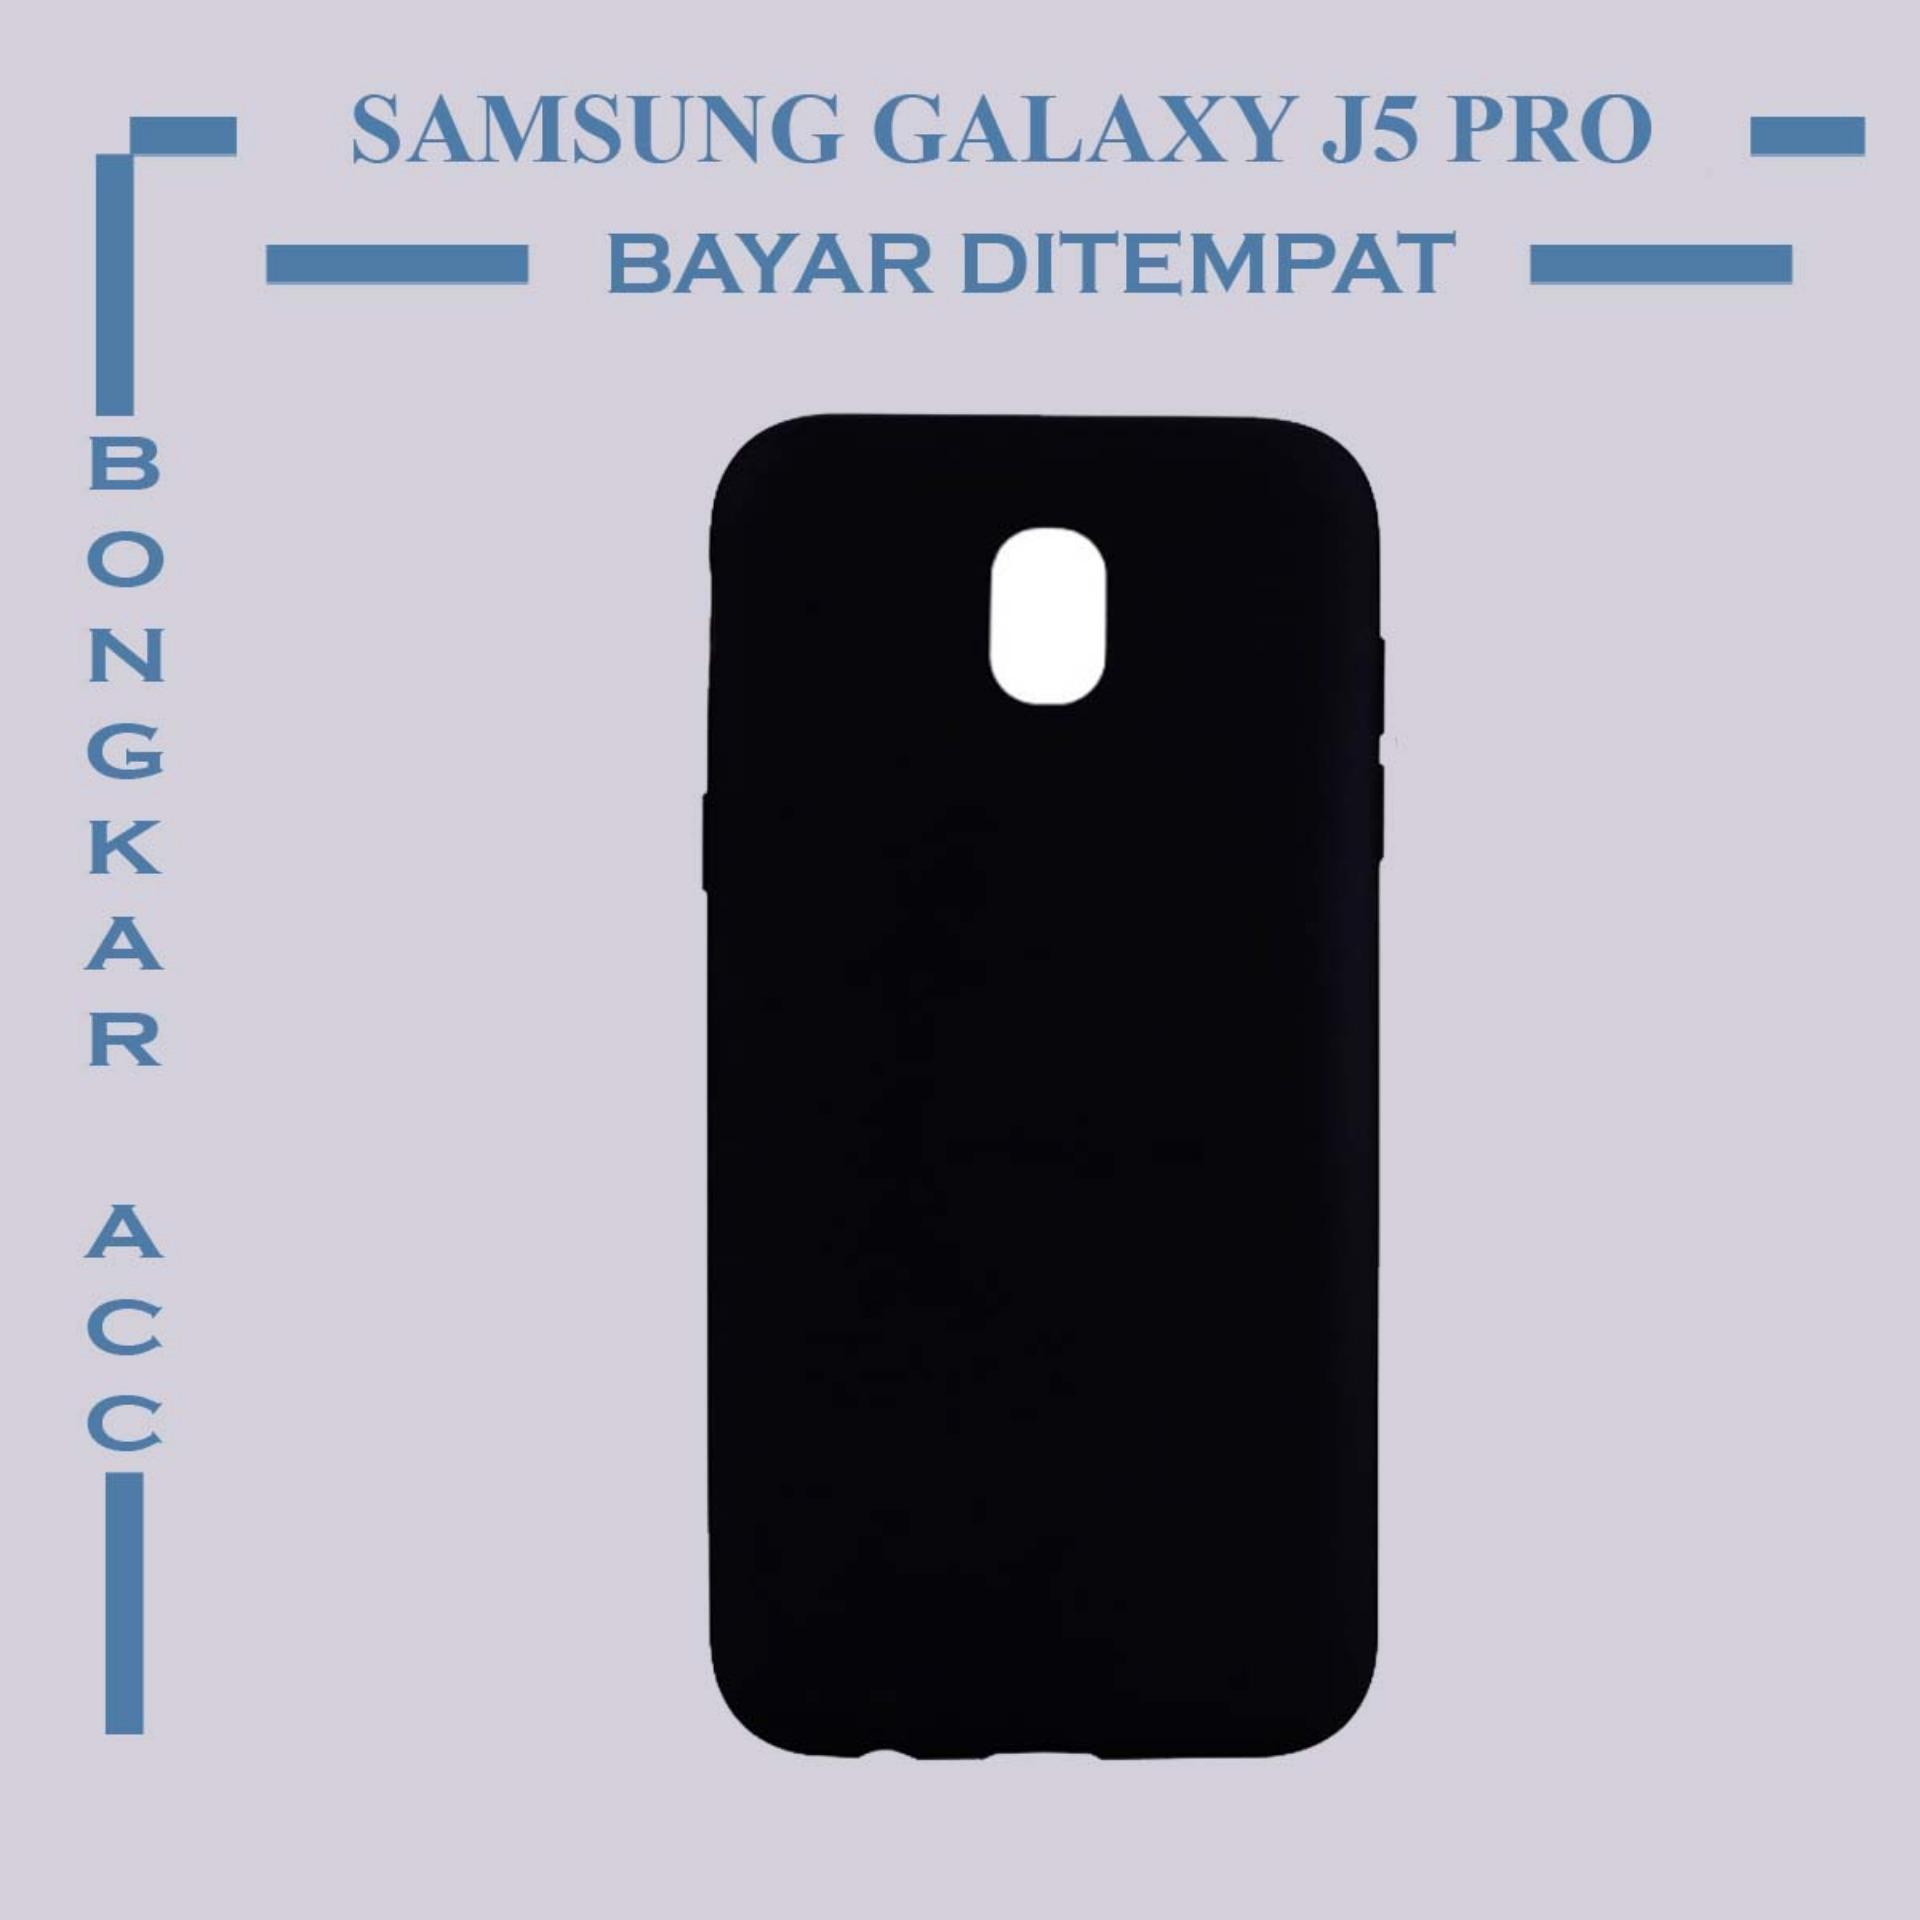 Samsung Galaxy J5 Pro Casing Hp Black Matte Ultraslim Shockproof Black Color Casing Hp Black Matte Samsung Galaxy J5 Pro Ultraslim Hitam Polos